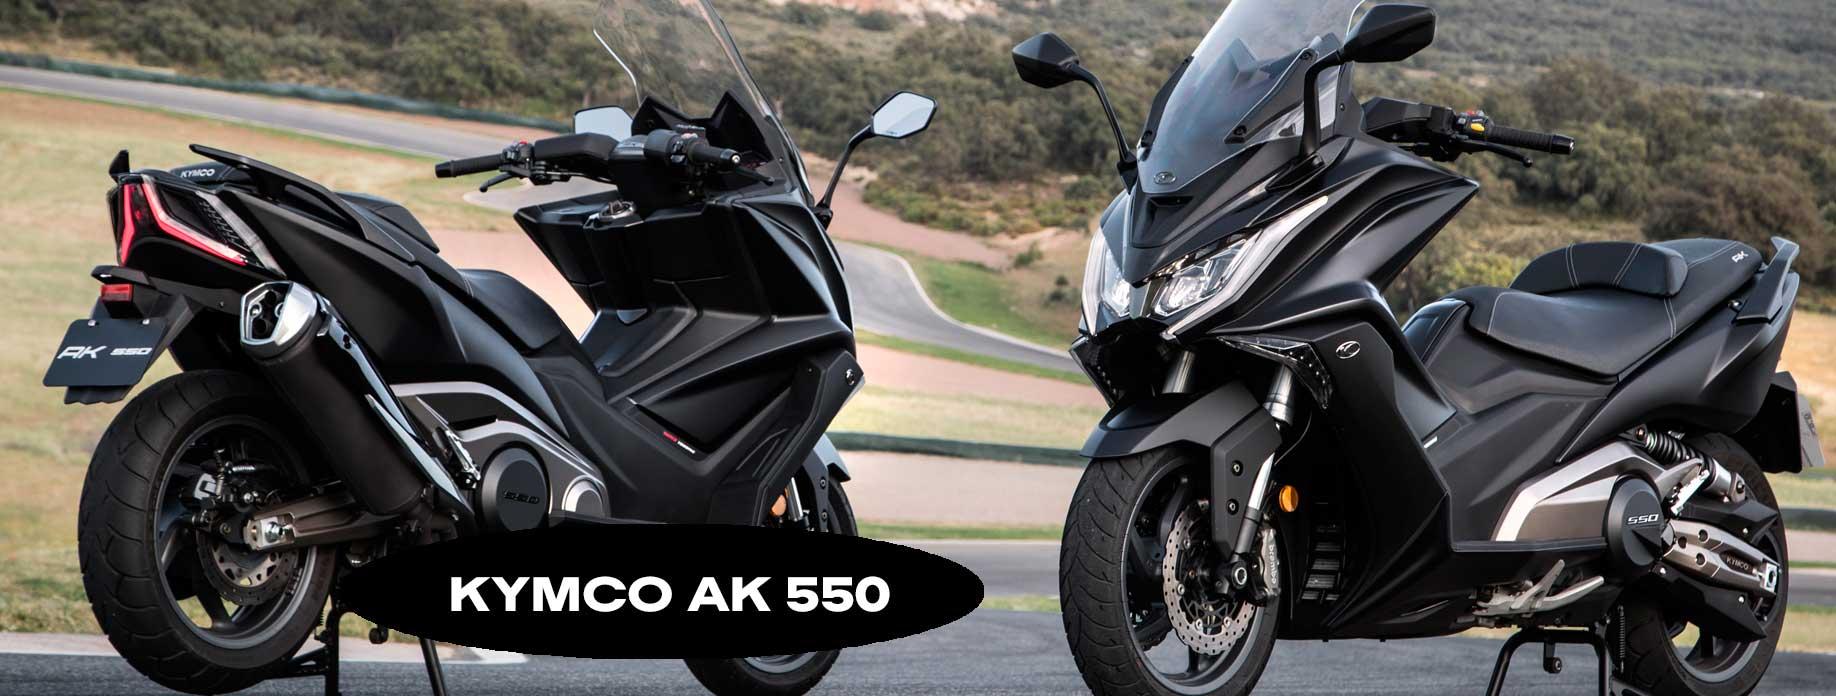 ak-550-slider-13